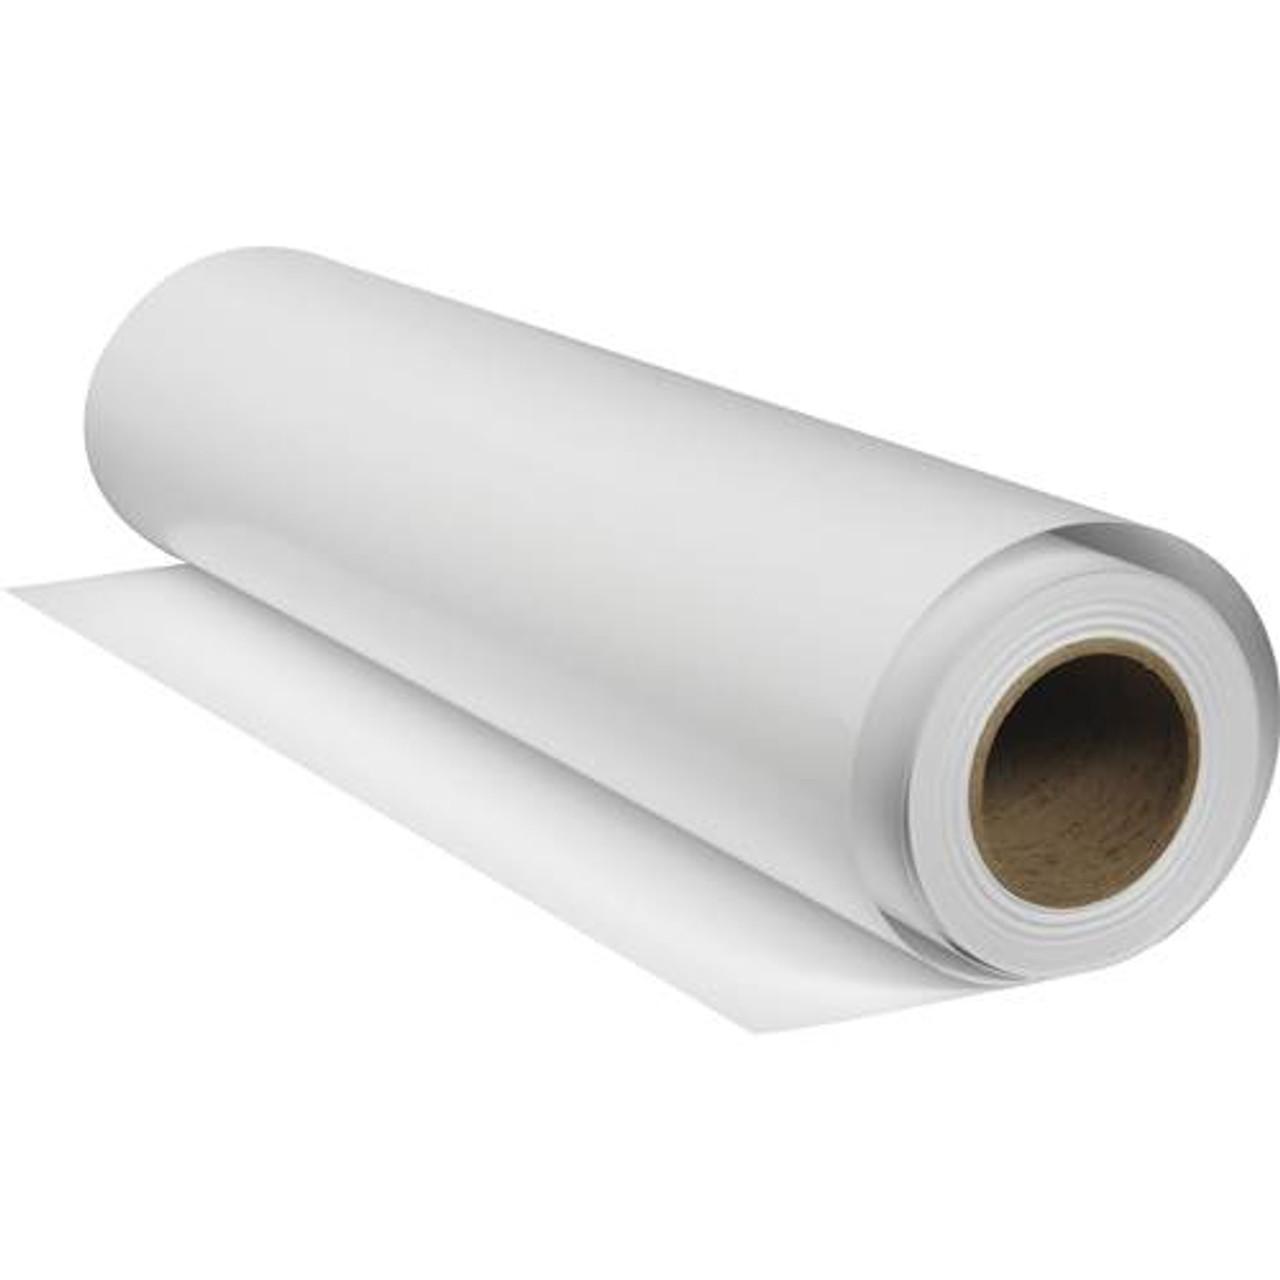 "Epson Ultra Premium Photo Paper Luster 36"" x 100'"